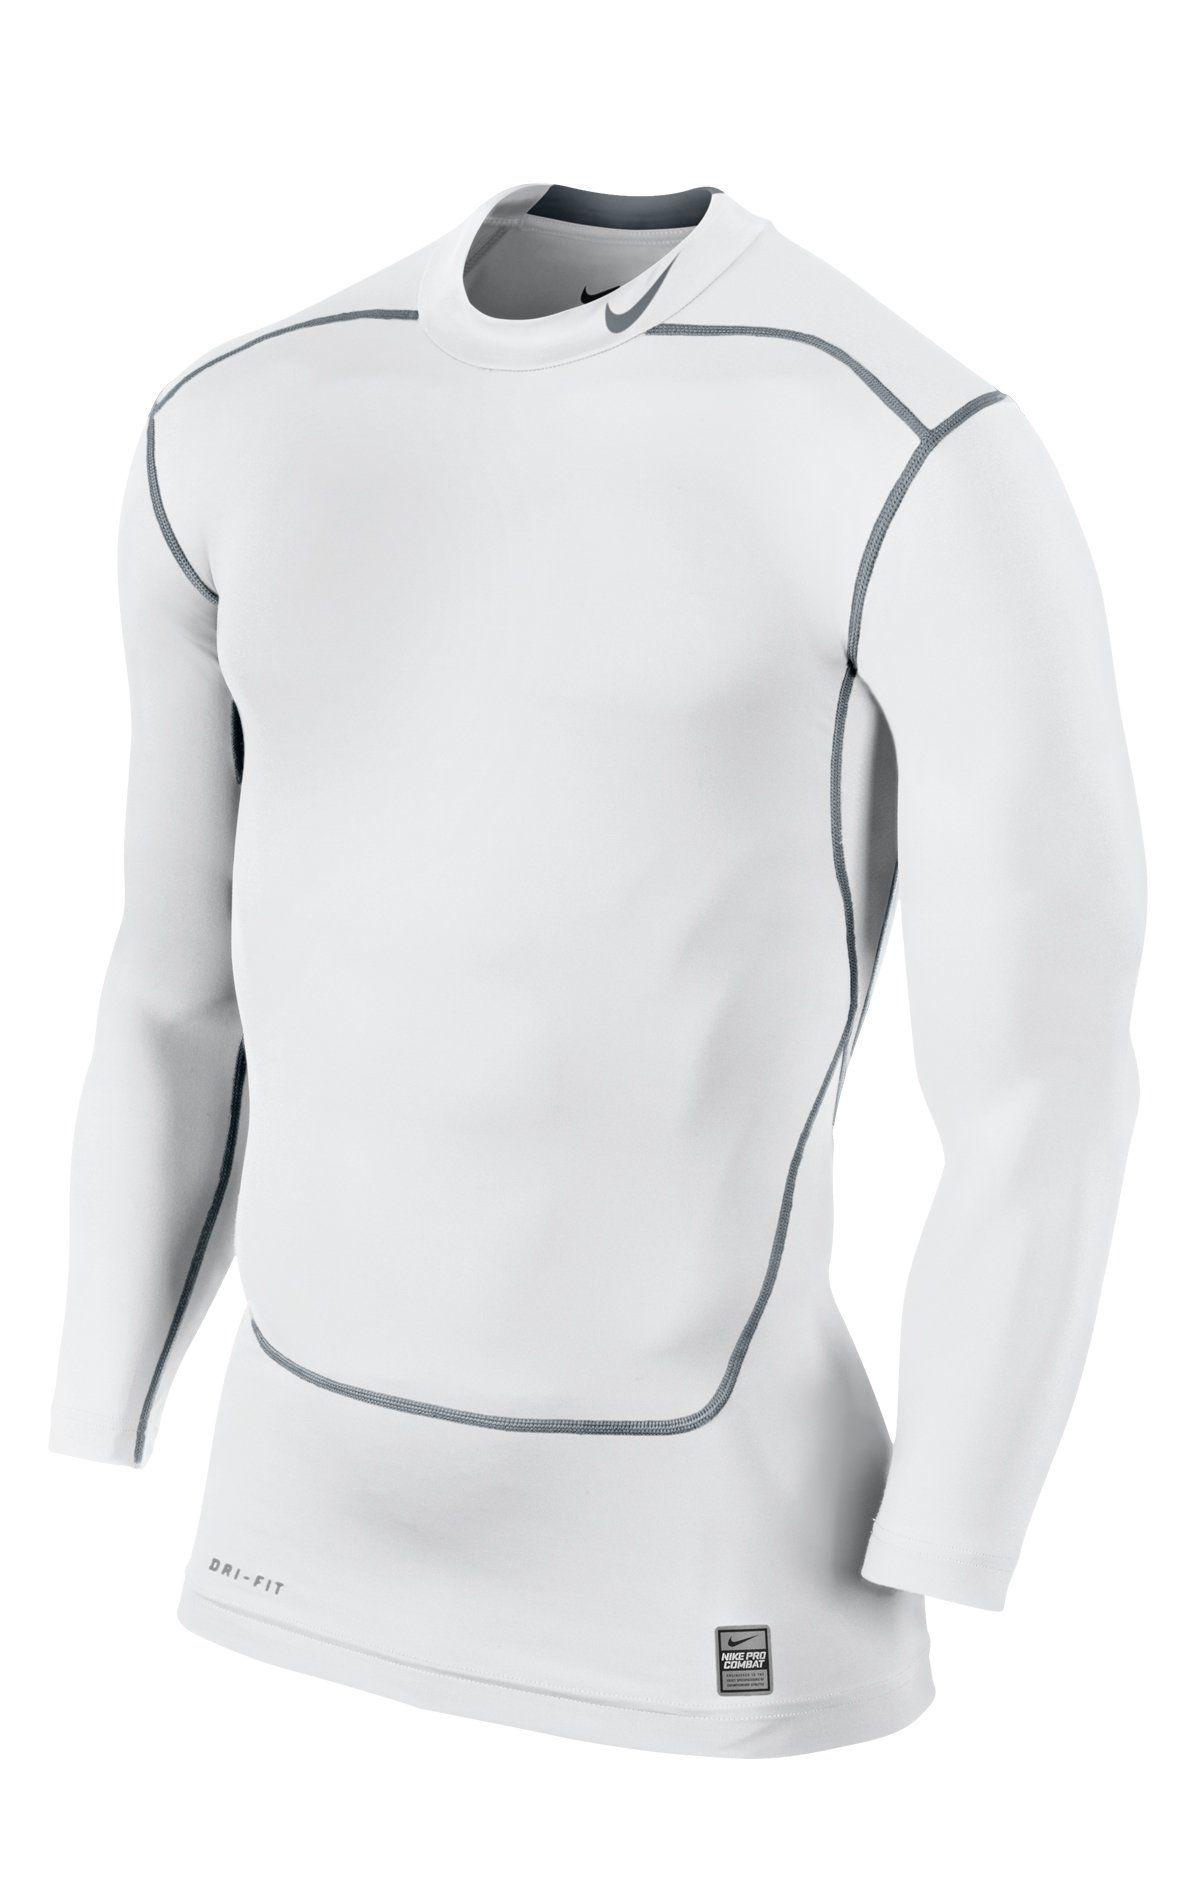 877447db Nike Mock 2.0 Men's Long-Sleeved Core Compression Shirt | Hot Gear ...